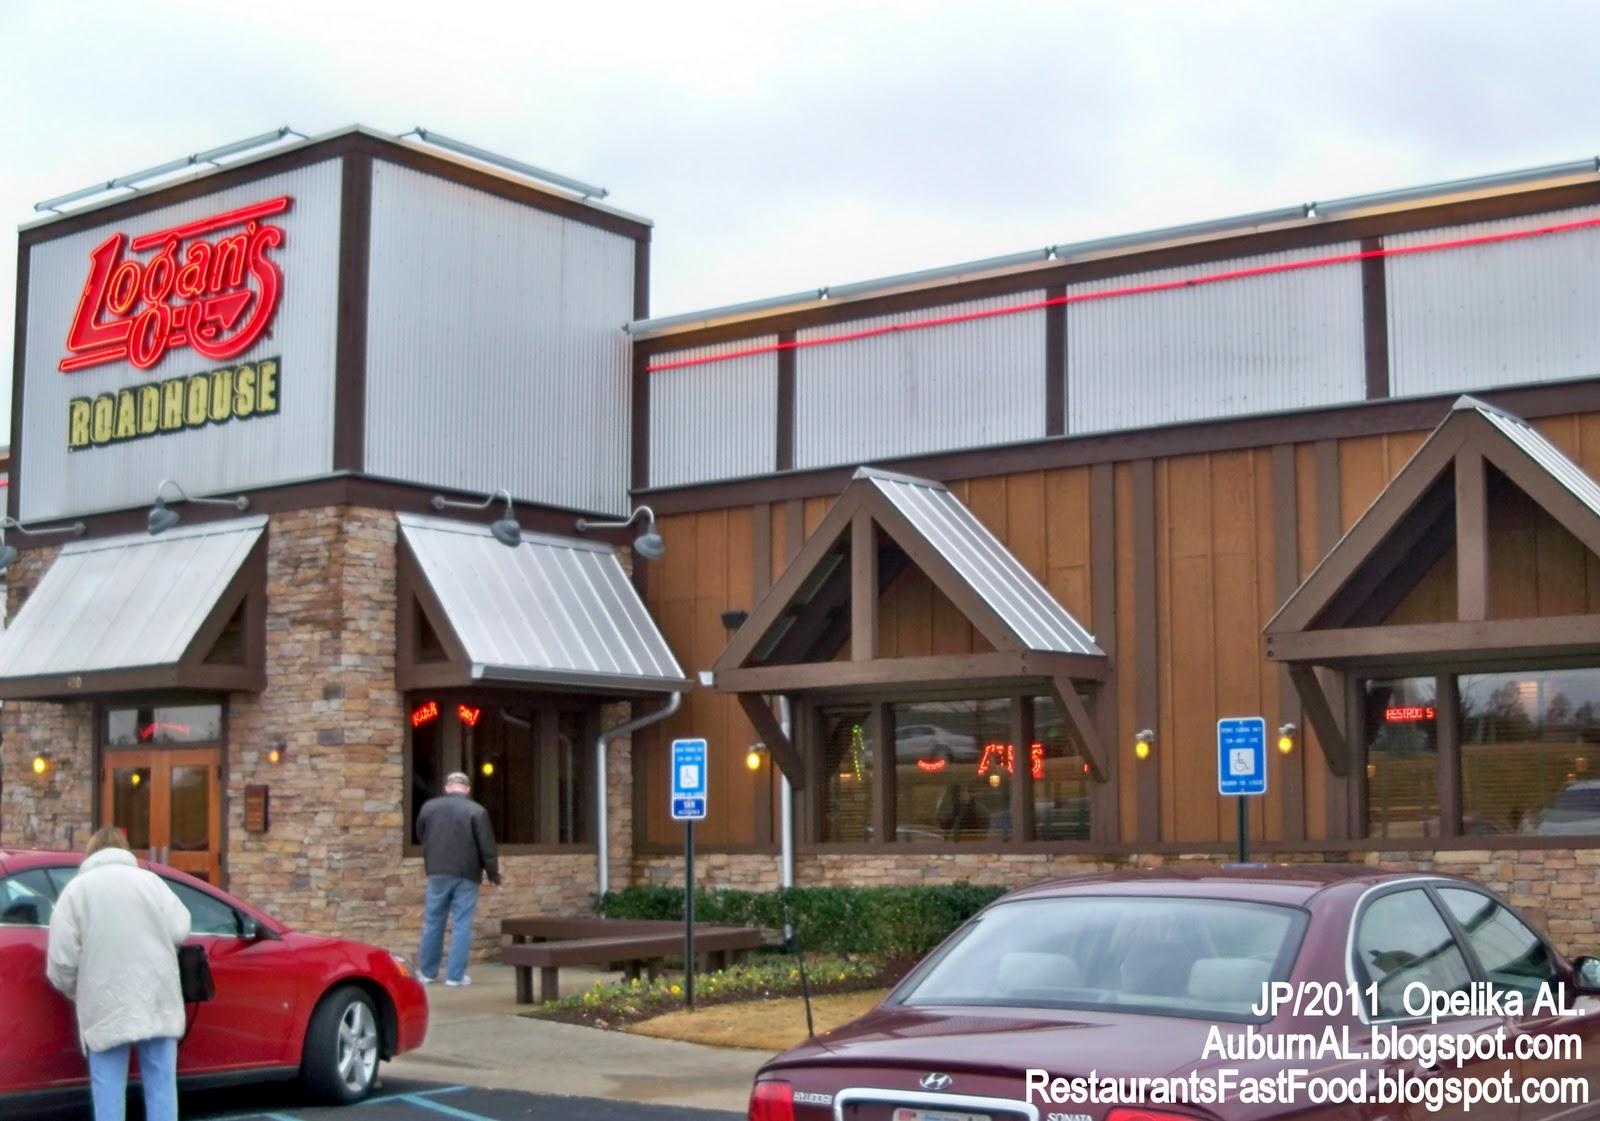 Logan S Roadhouse Restaurant Opelika Auburn Alabama Gateway Dr Al Lee County